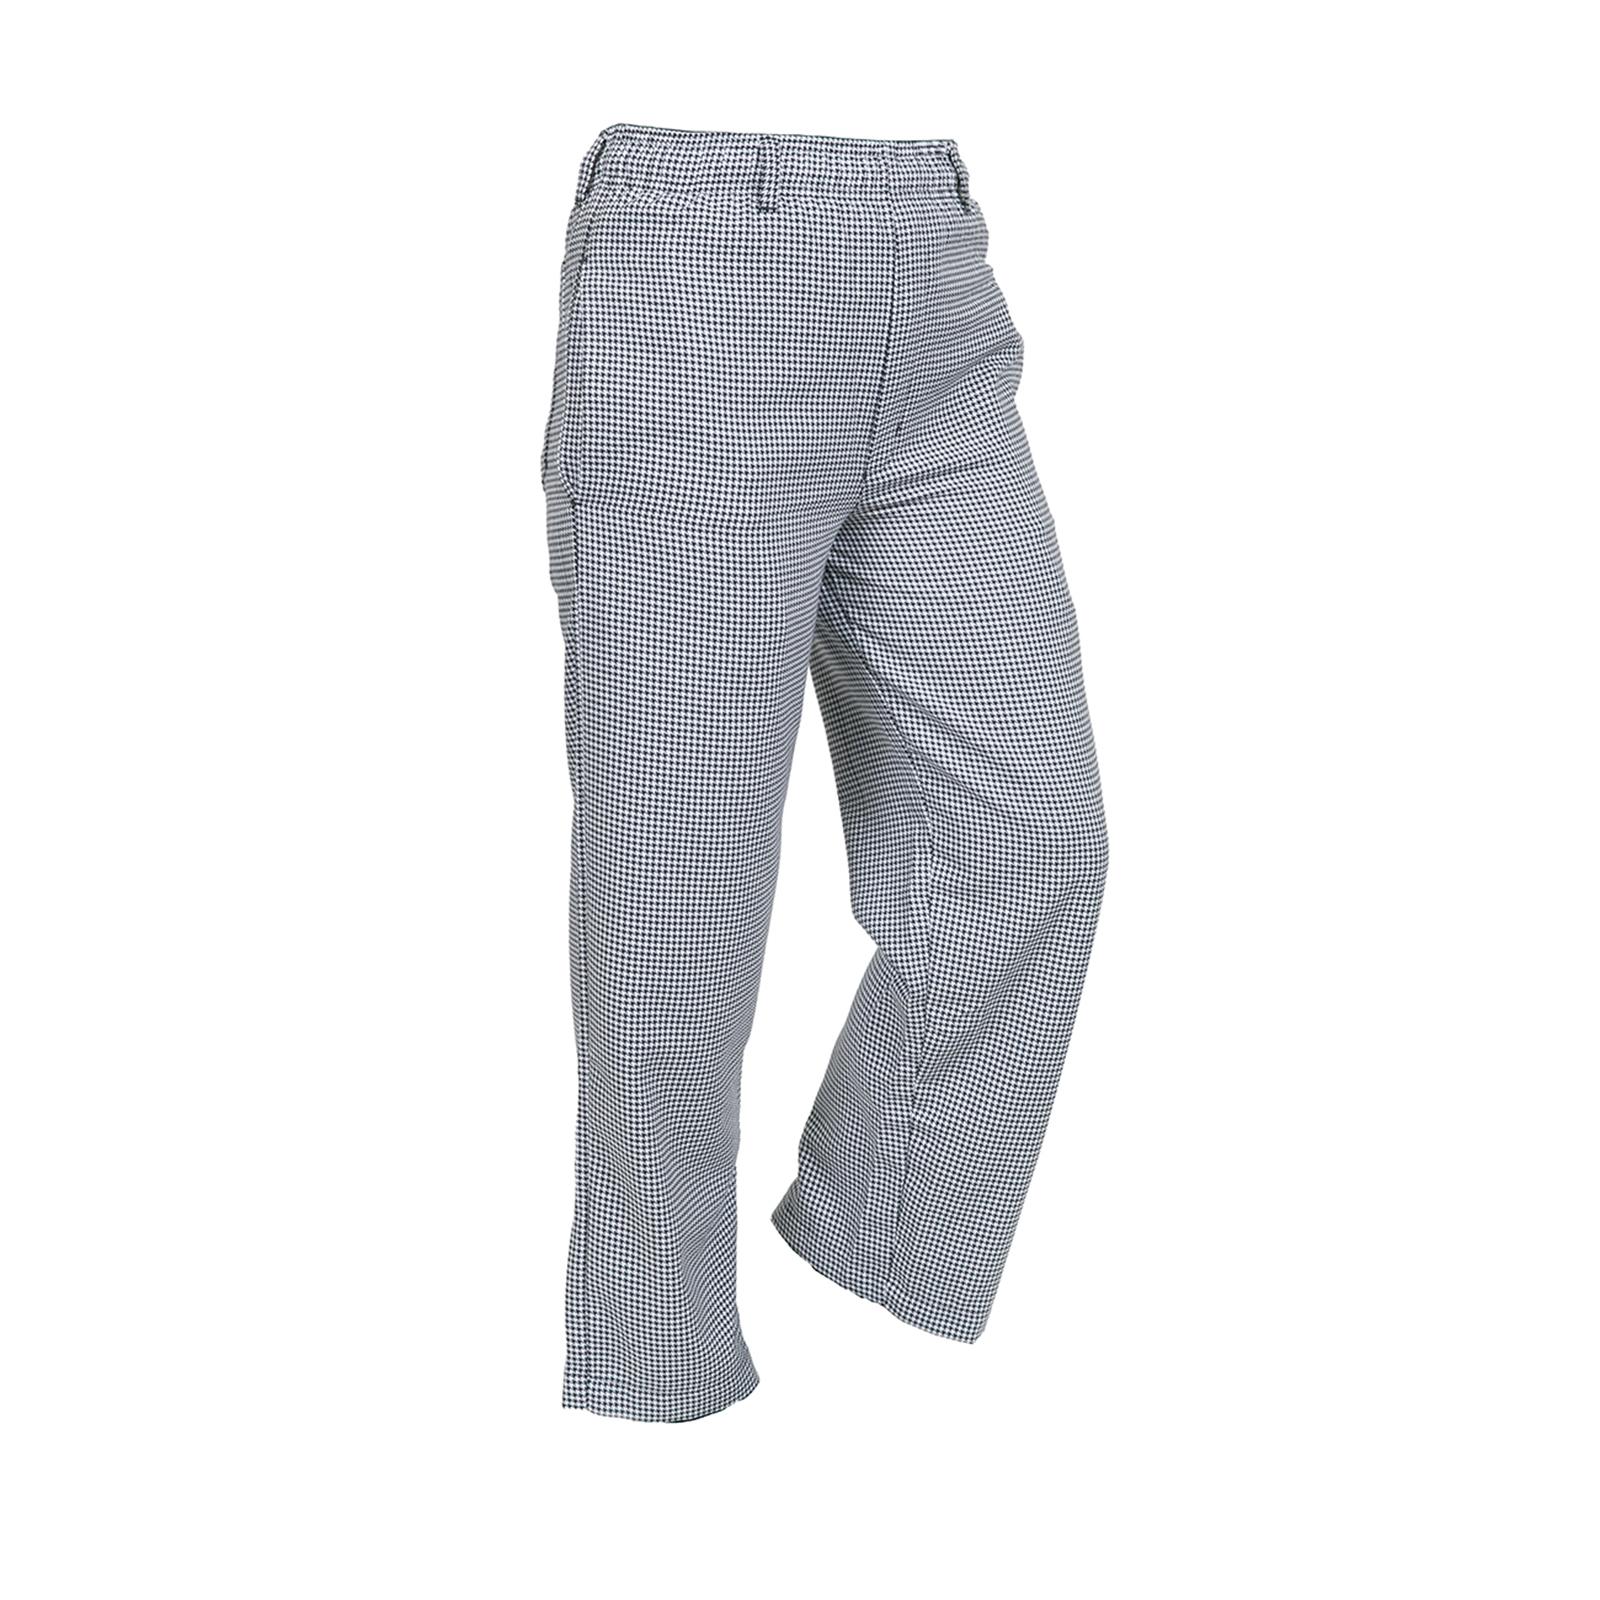 Mercer Culinary M60030HT1X chef's pants